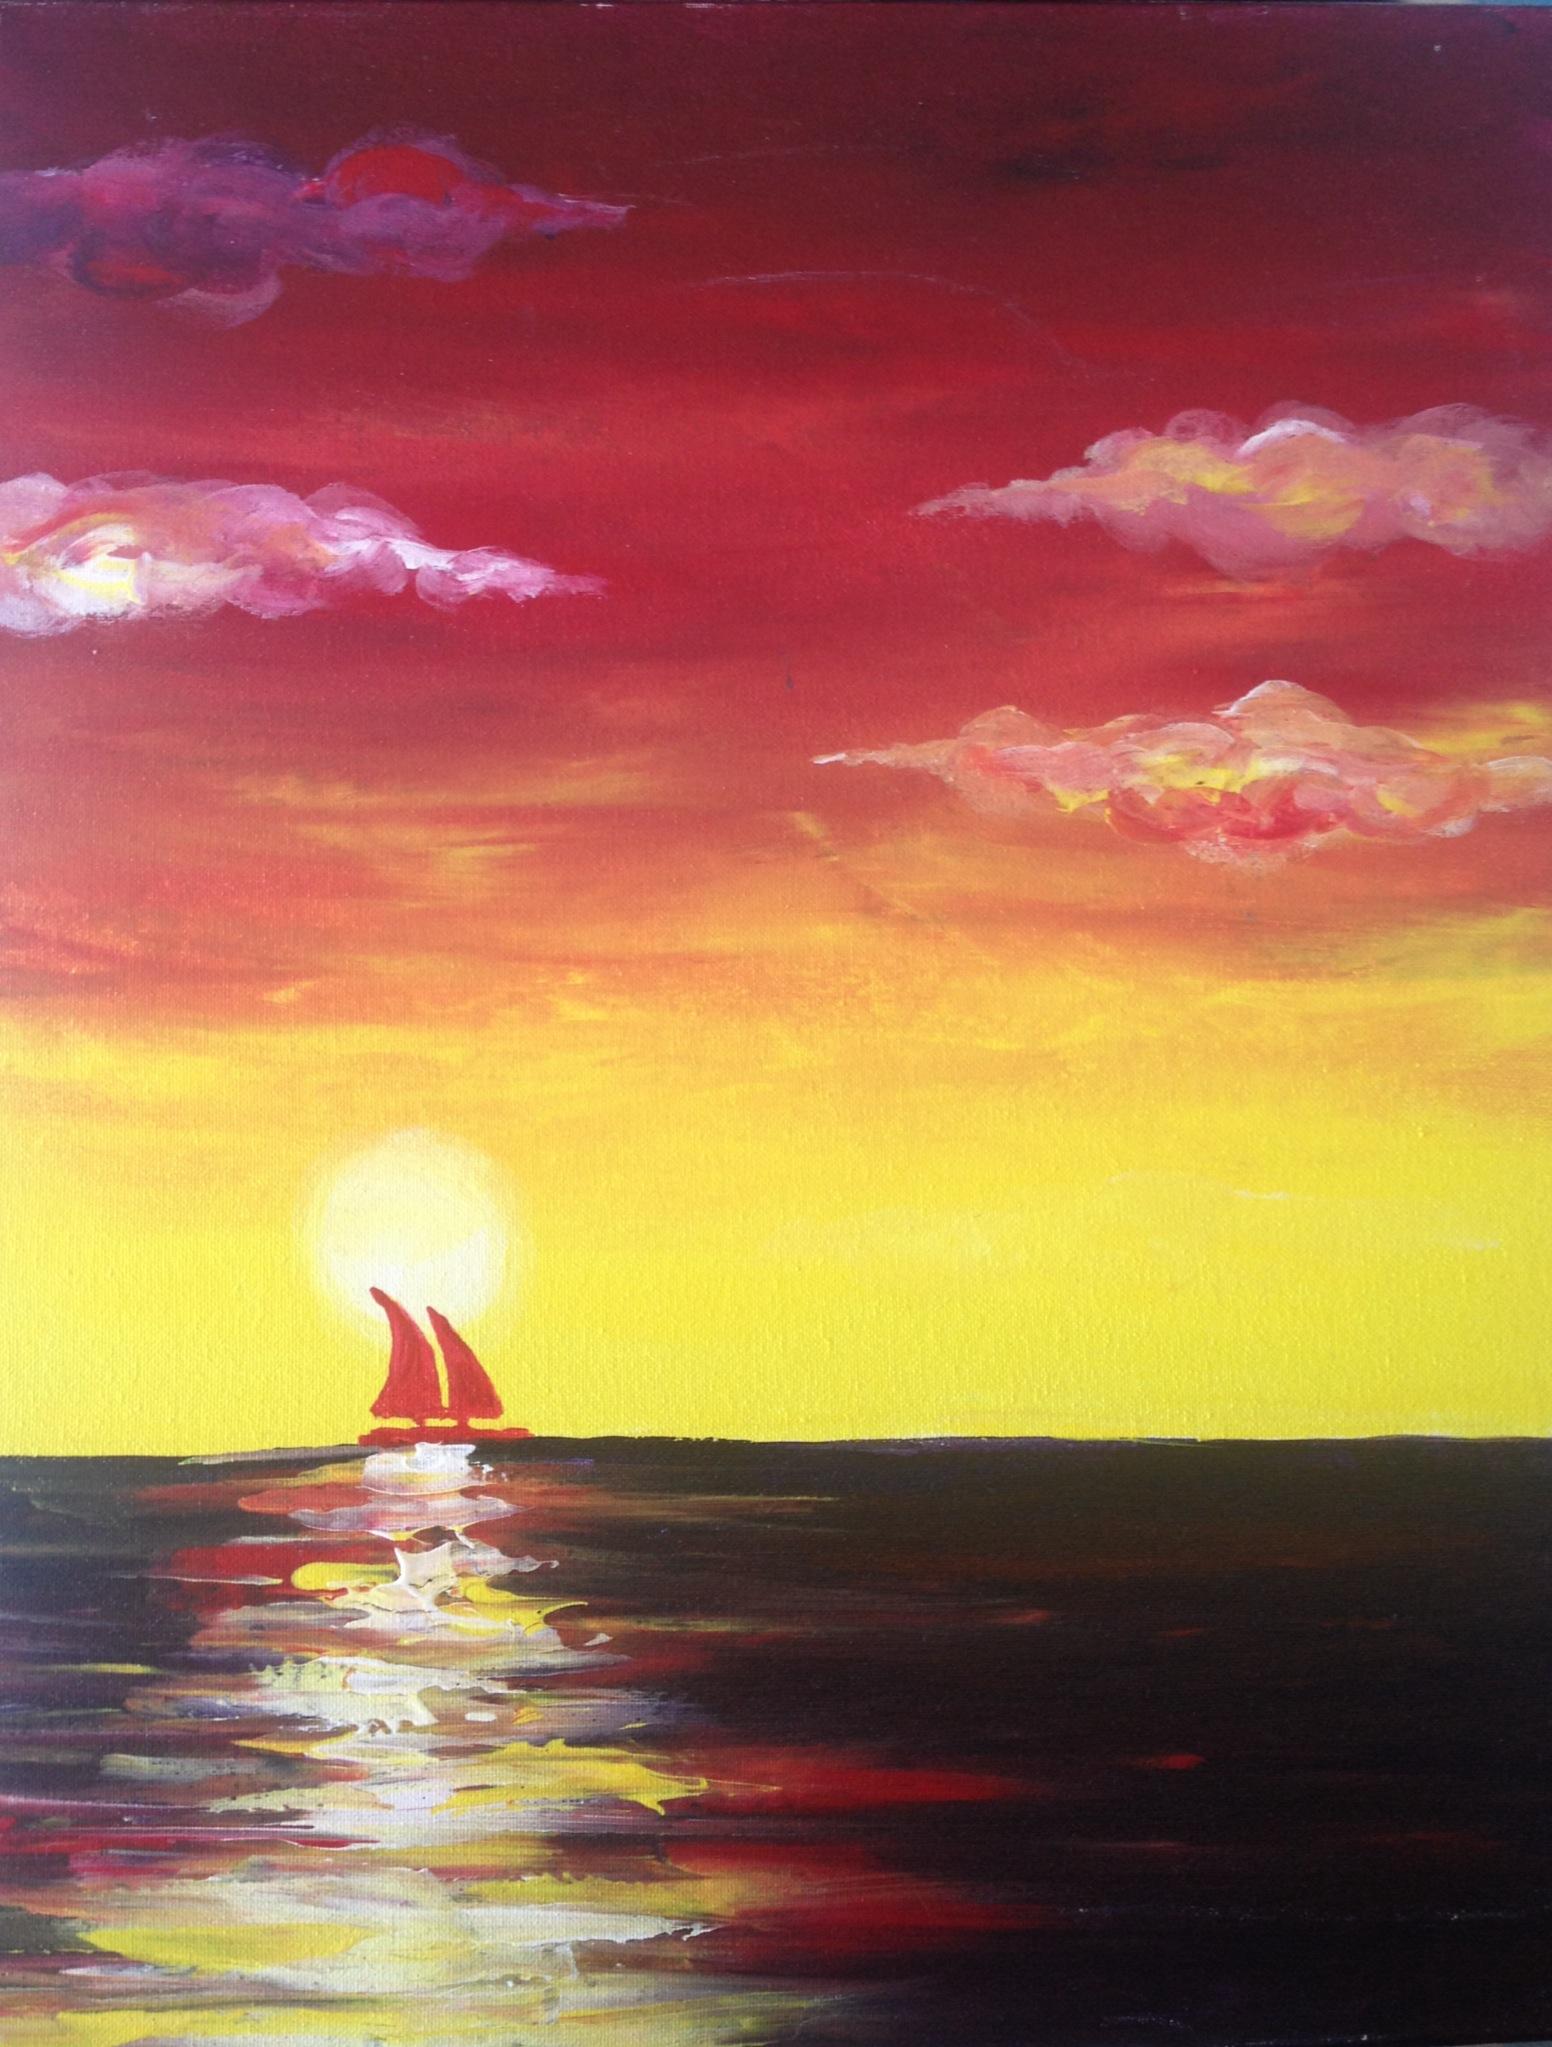 paintings537a9c4fc7f090.44912844.jpg